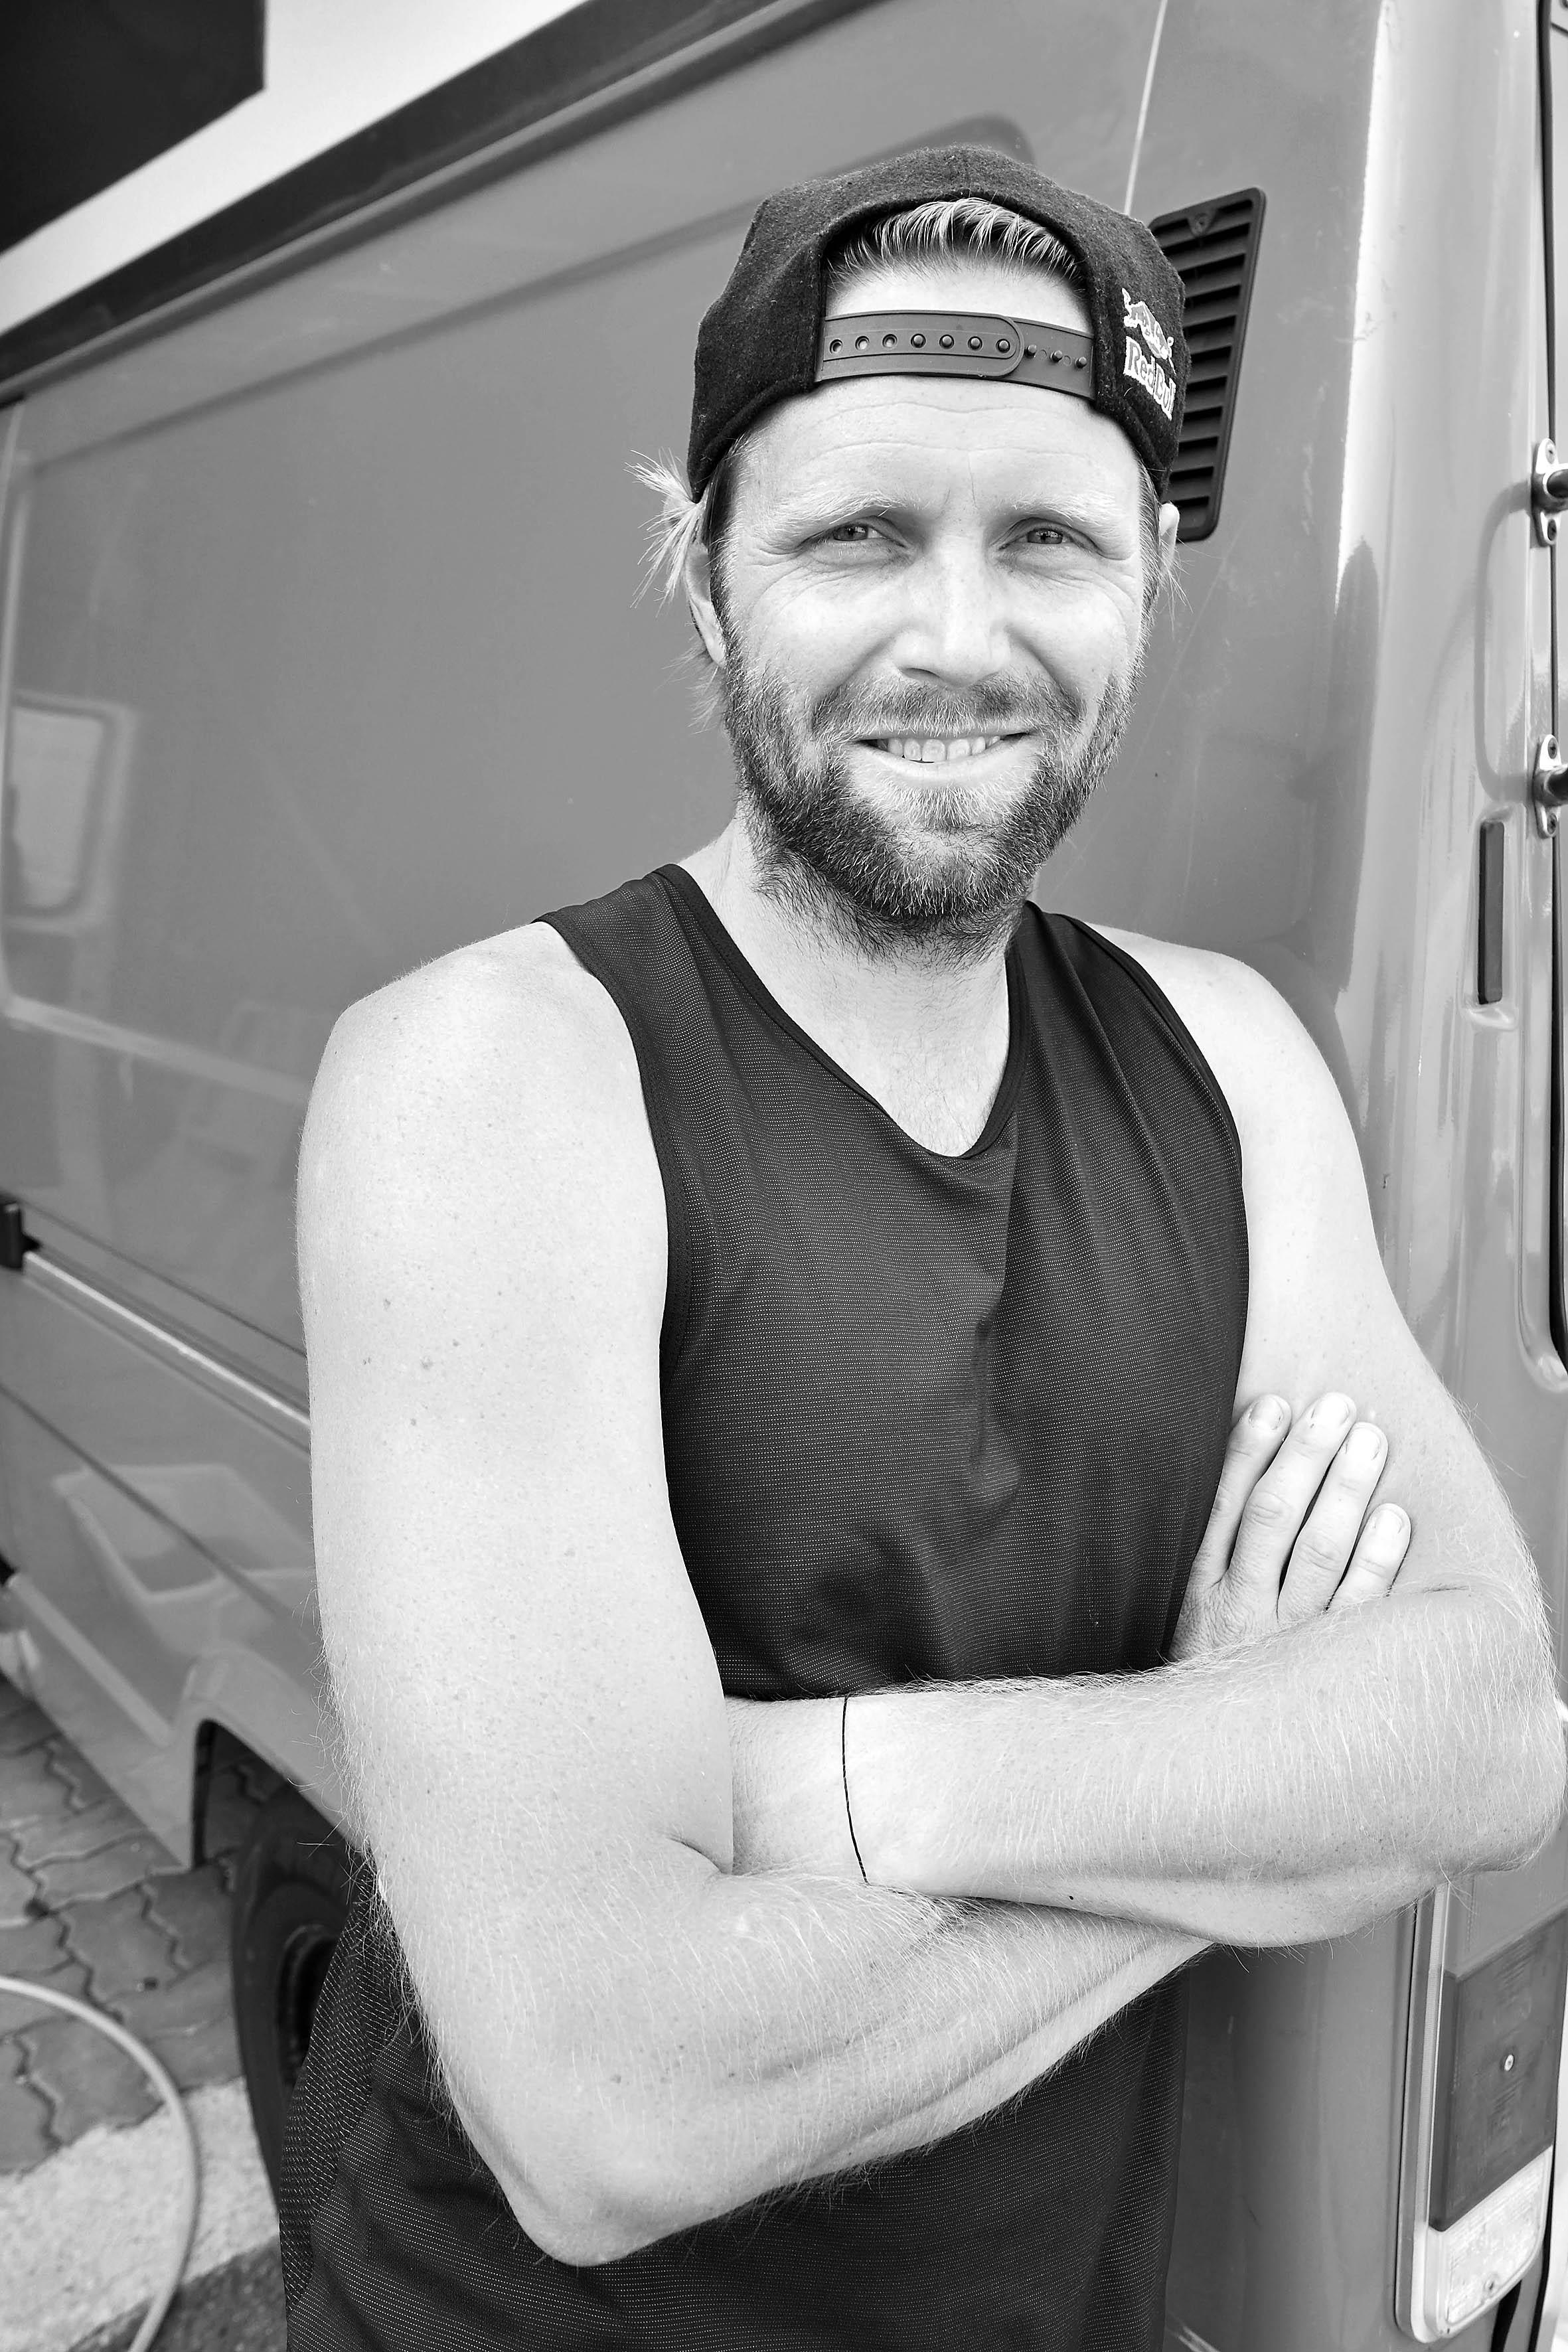 Stolzer Mini-Van-Besitzer: Beachvolleyballer Julius Brink. Olympiasieger (2012), Weltmeister (2009), Europameister (2006, 2011, 2012), Deutscher Meister (2006, 2007, 2010, 2011) und Beachvolleyballer des Jahres (2005, 2006, 2009, 2010, 2011, 2012). Foto: Michael B. Rehders